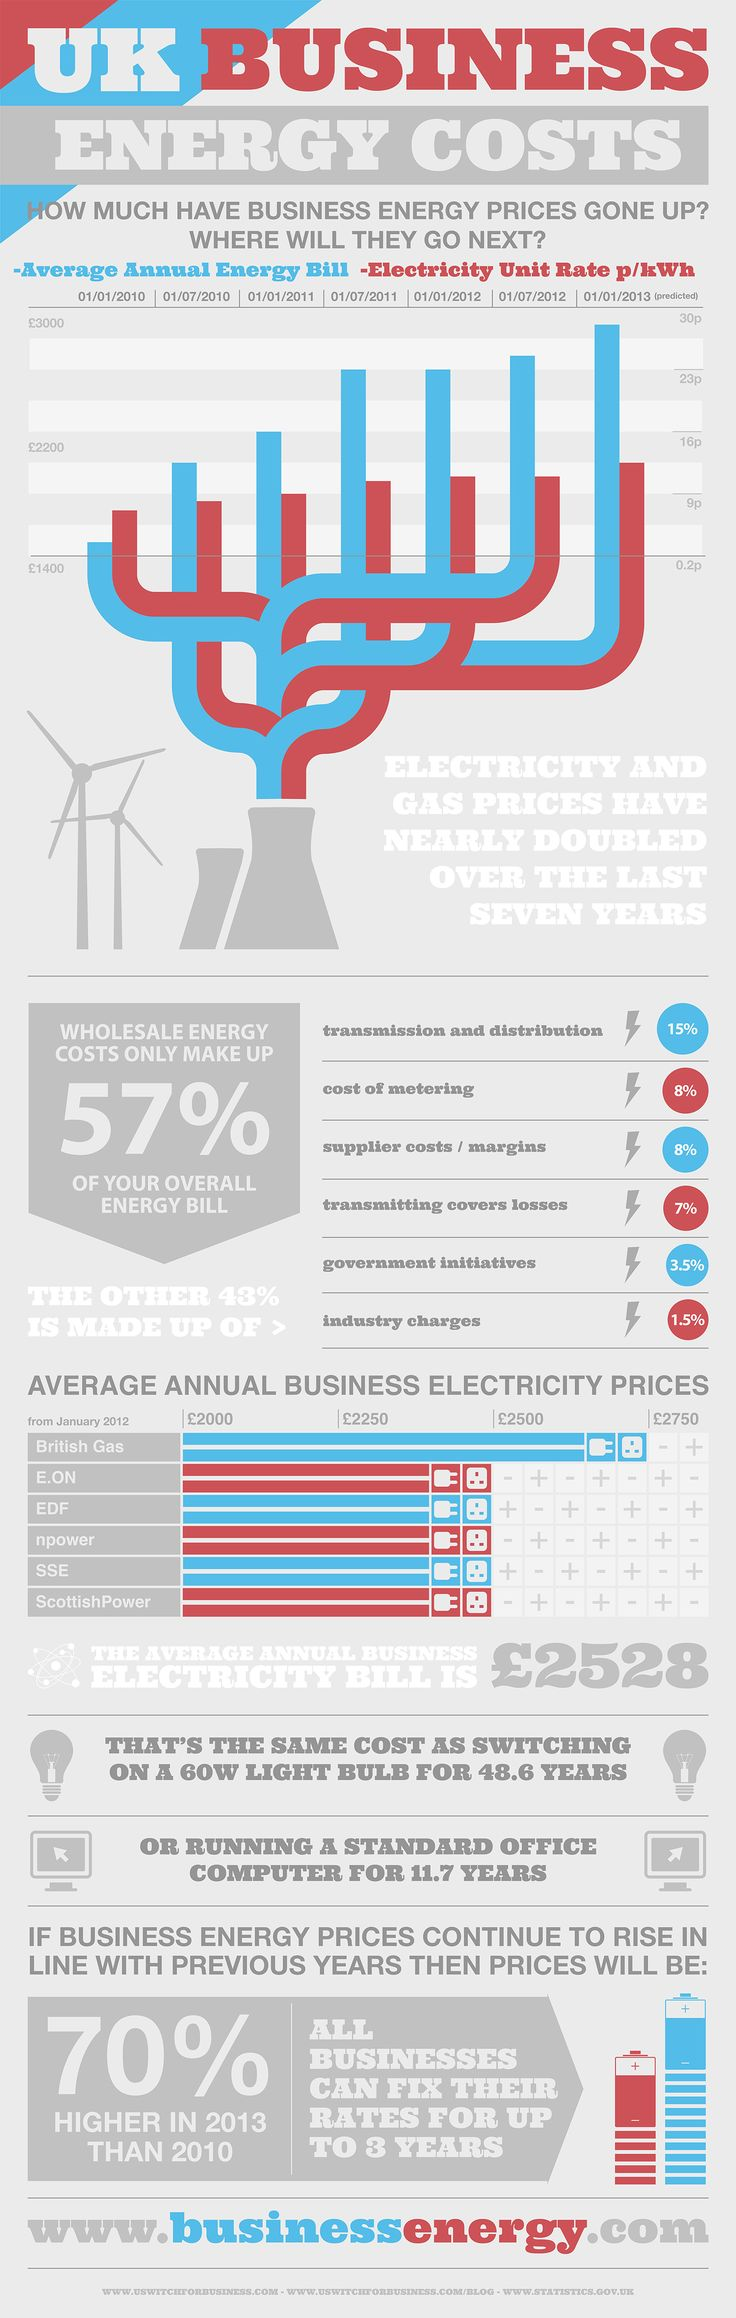 UK business energy costs